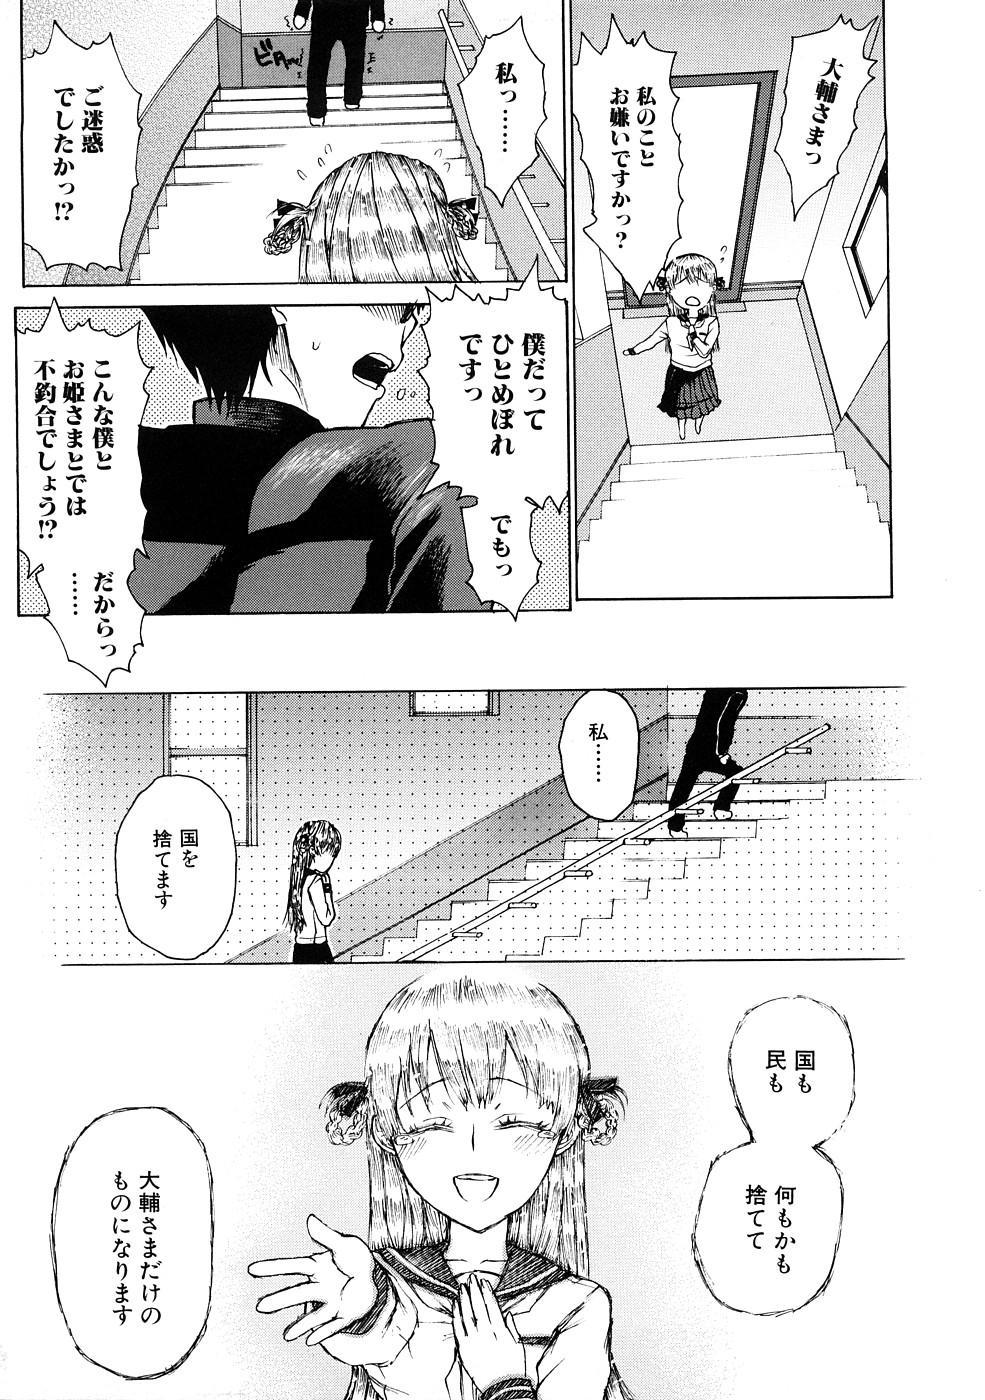 Ecchi de Jibunkatte de Kawaii Ko 10